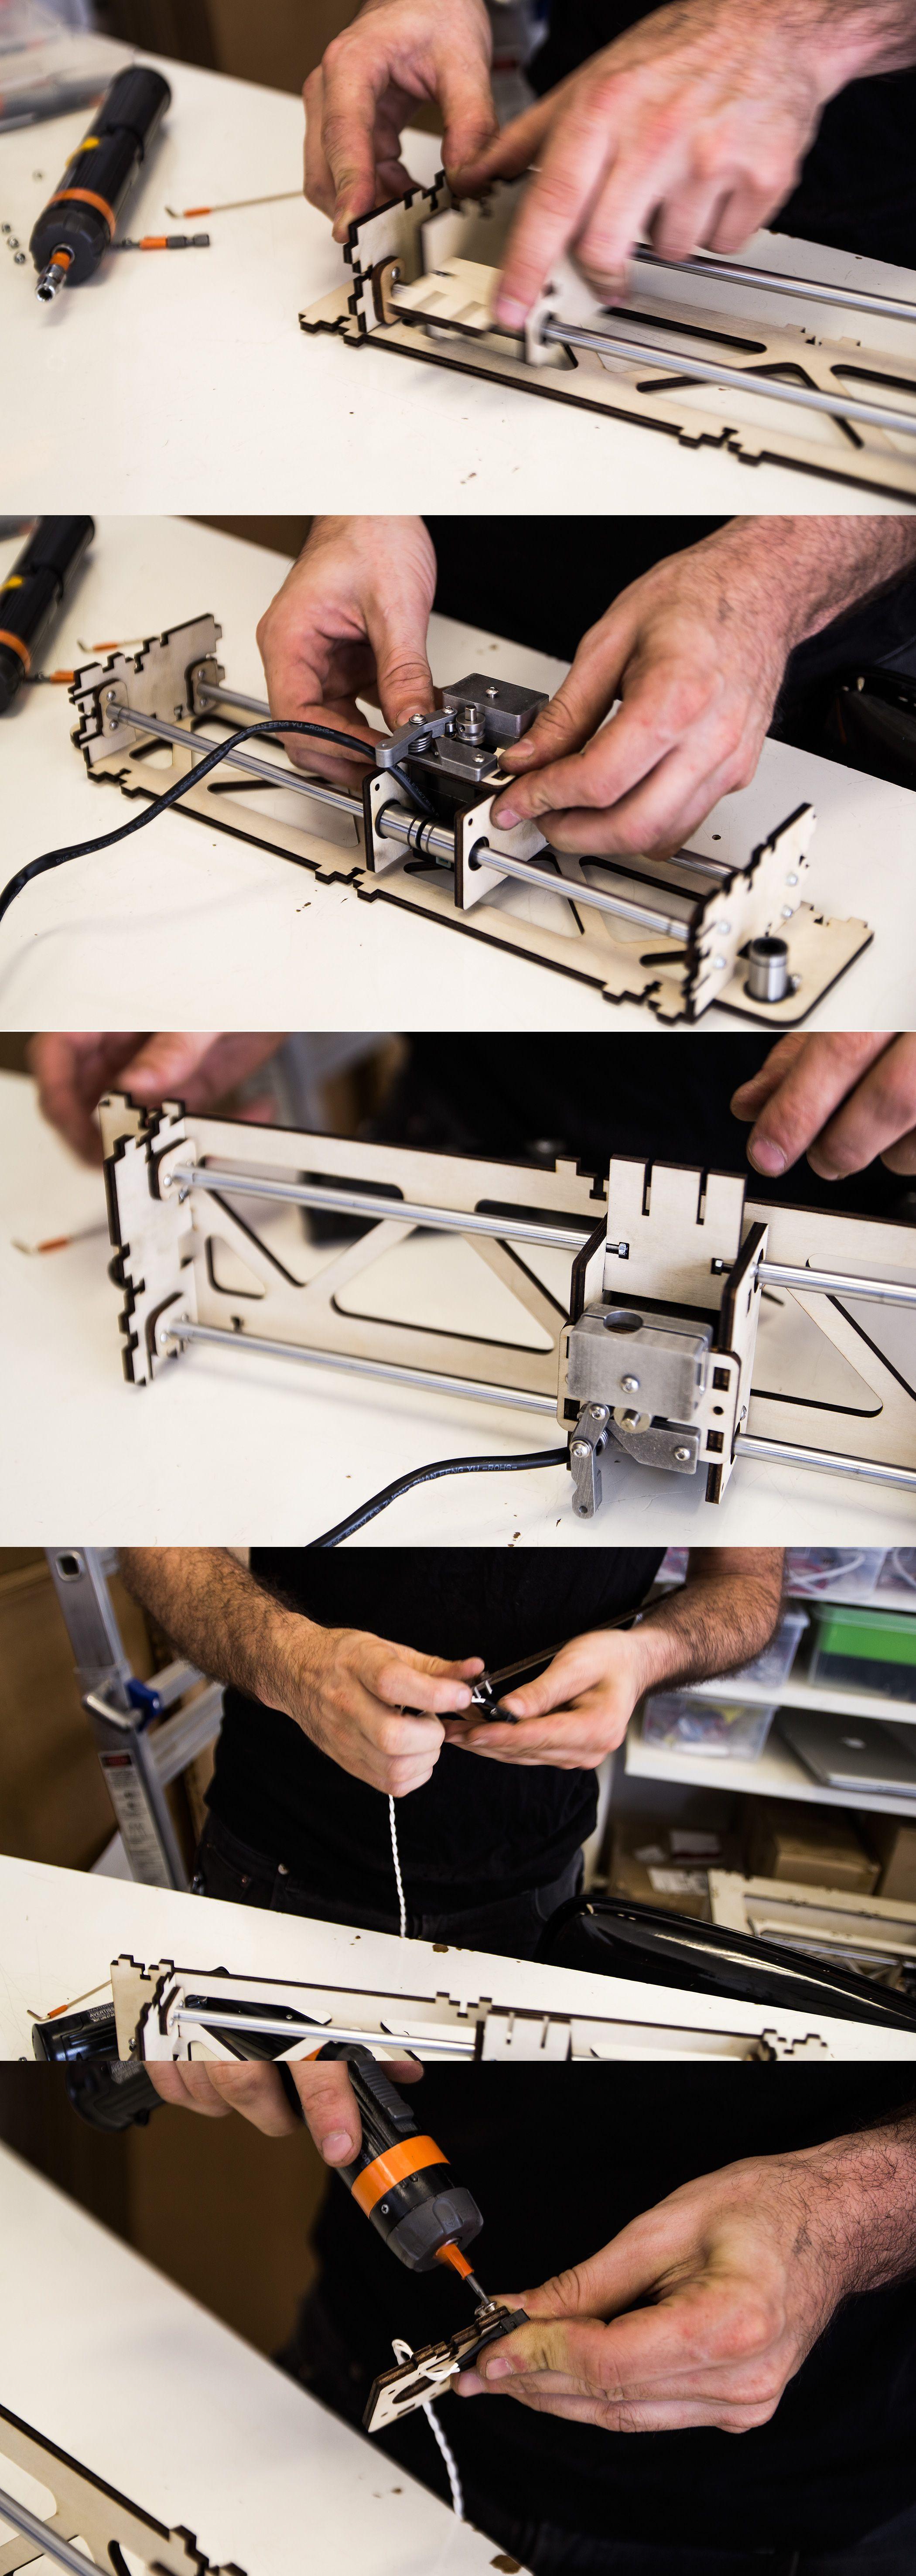 Hos Type A Machines blir skriverne presist montert for hånd.Foto: Varg Aamo, Hardware.no